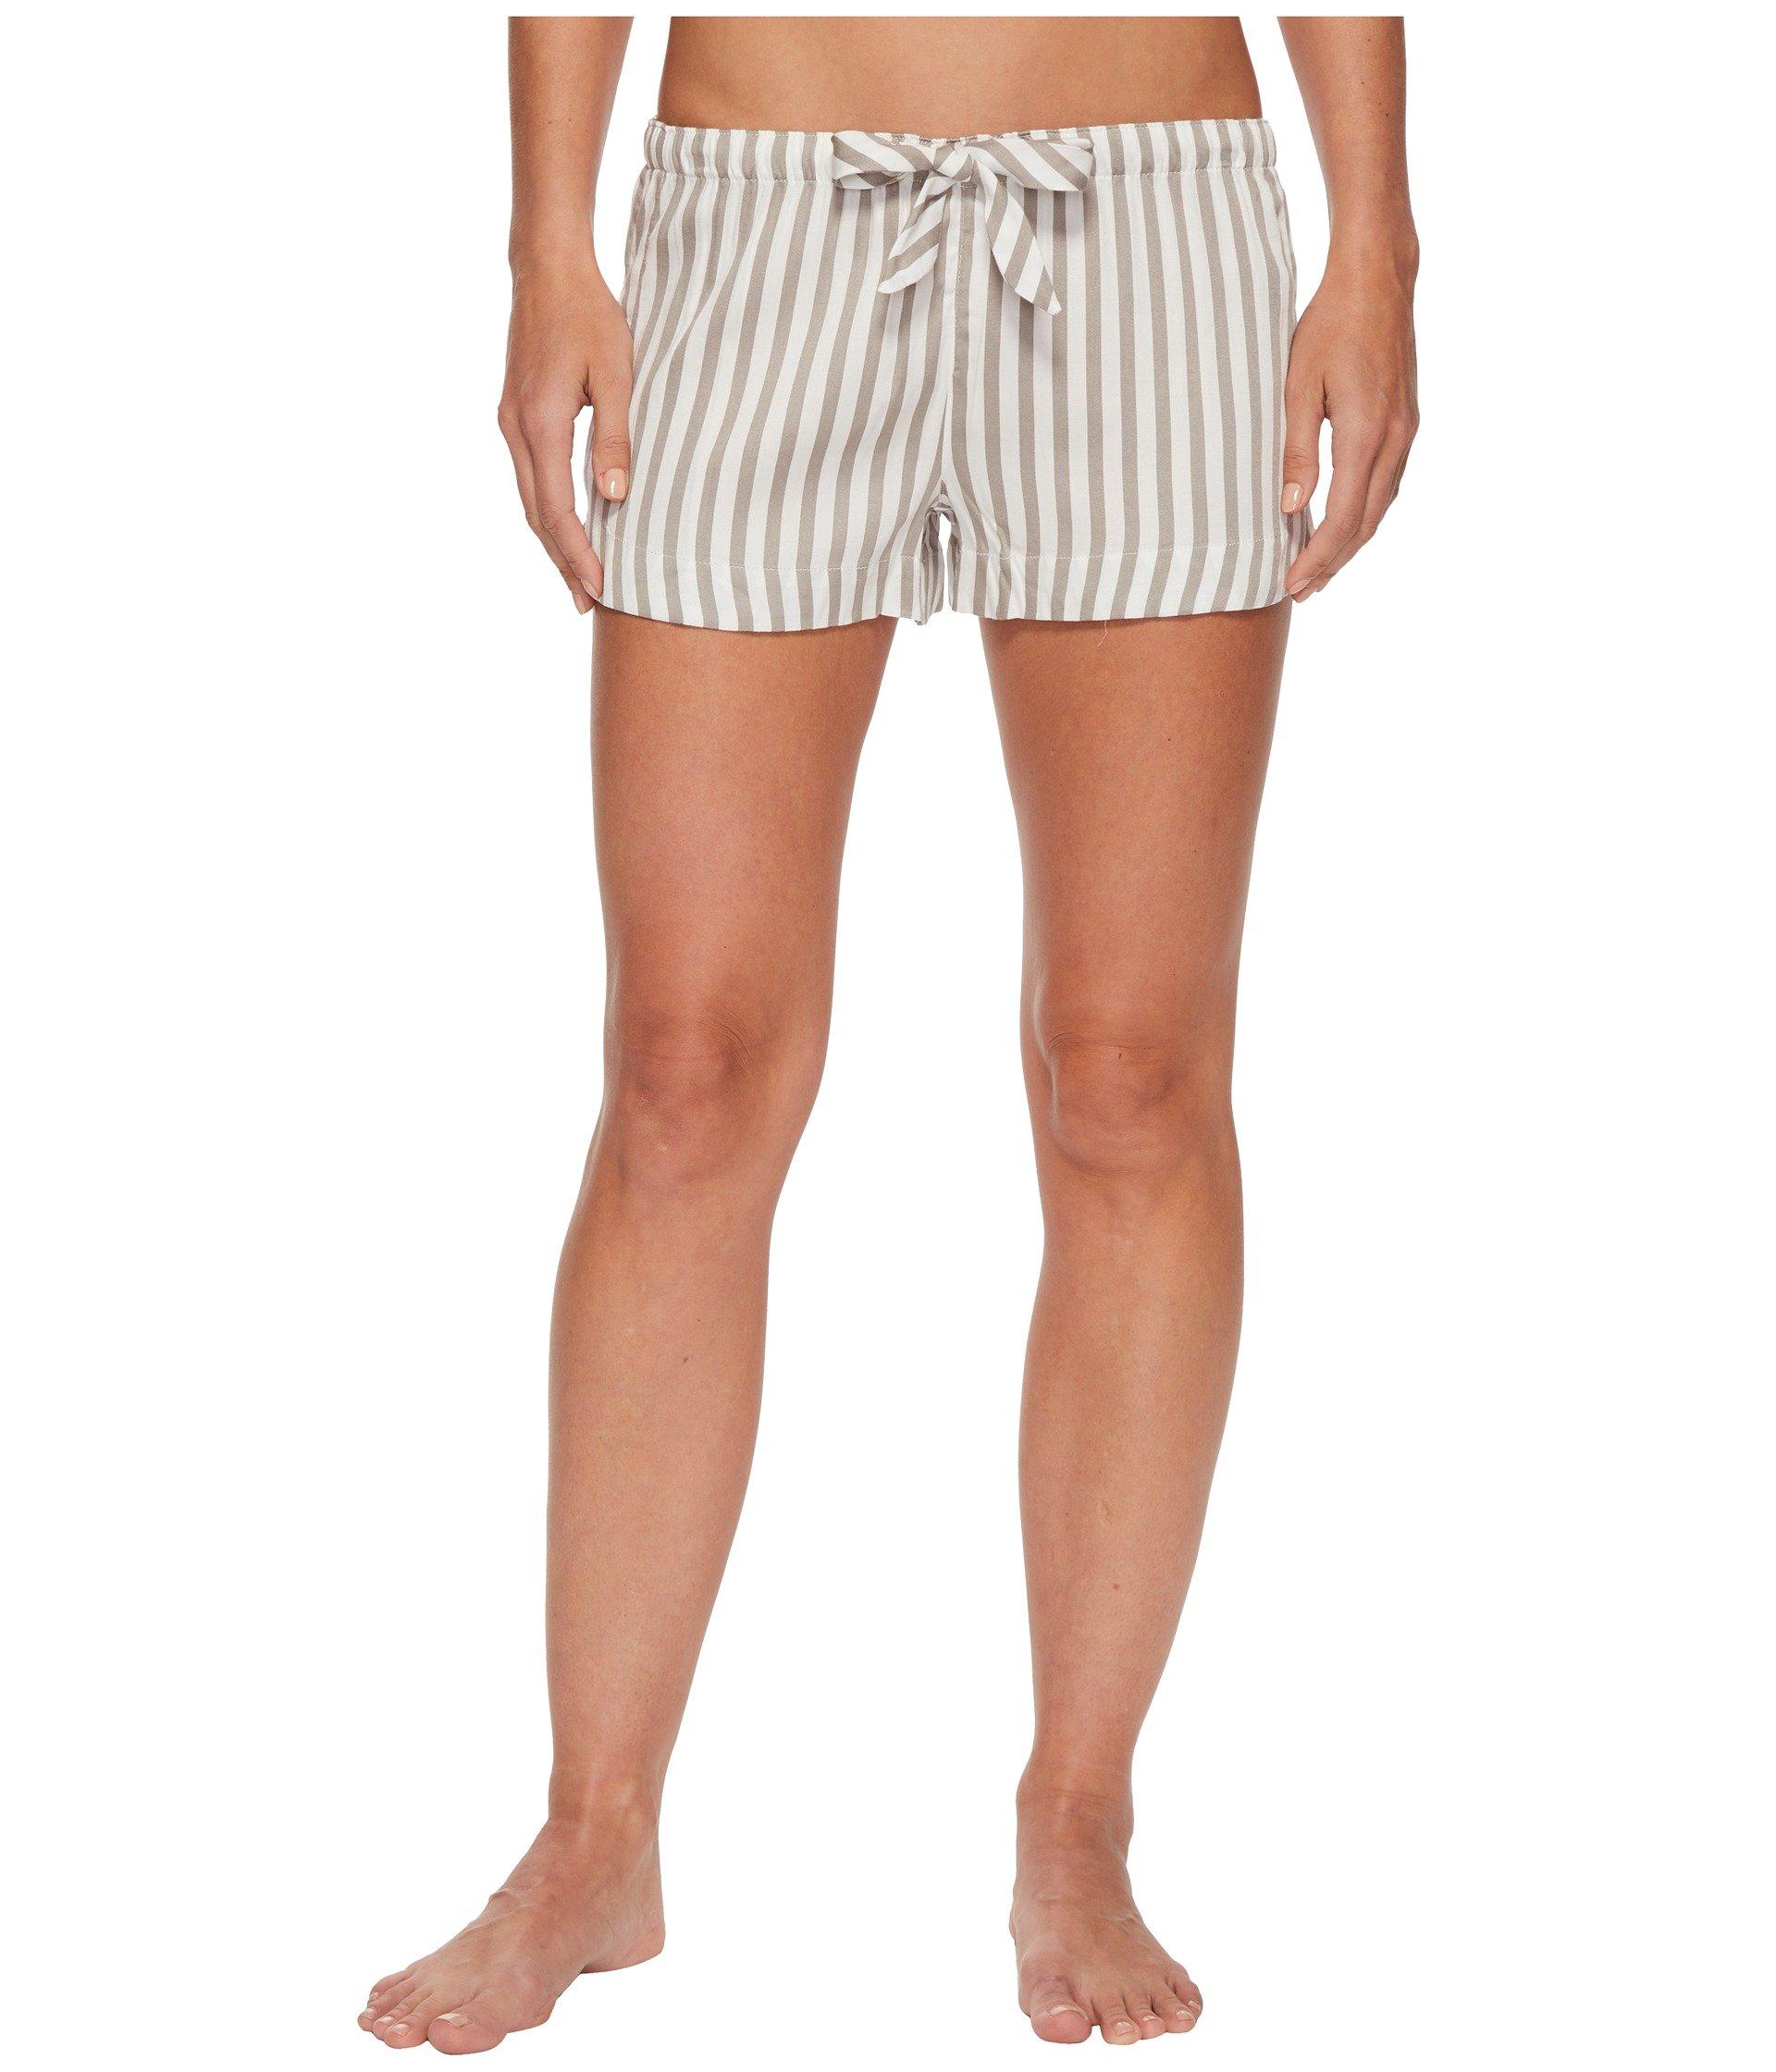 Pantalón de Pijama para Mujer P.J. Salvage Walk The Line Grey Striped Shorts  + P.J. Salvage en VeoyCompro.net